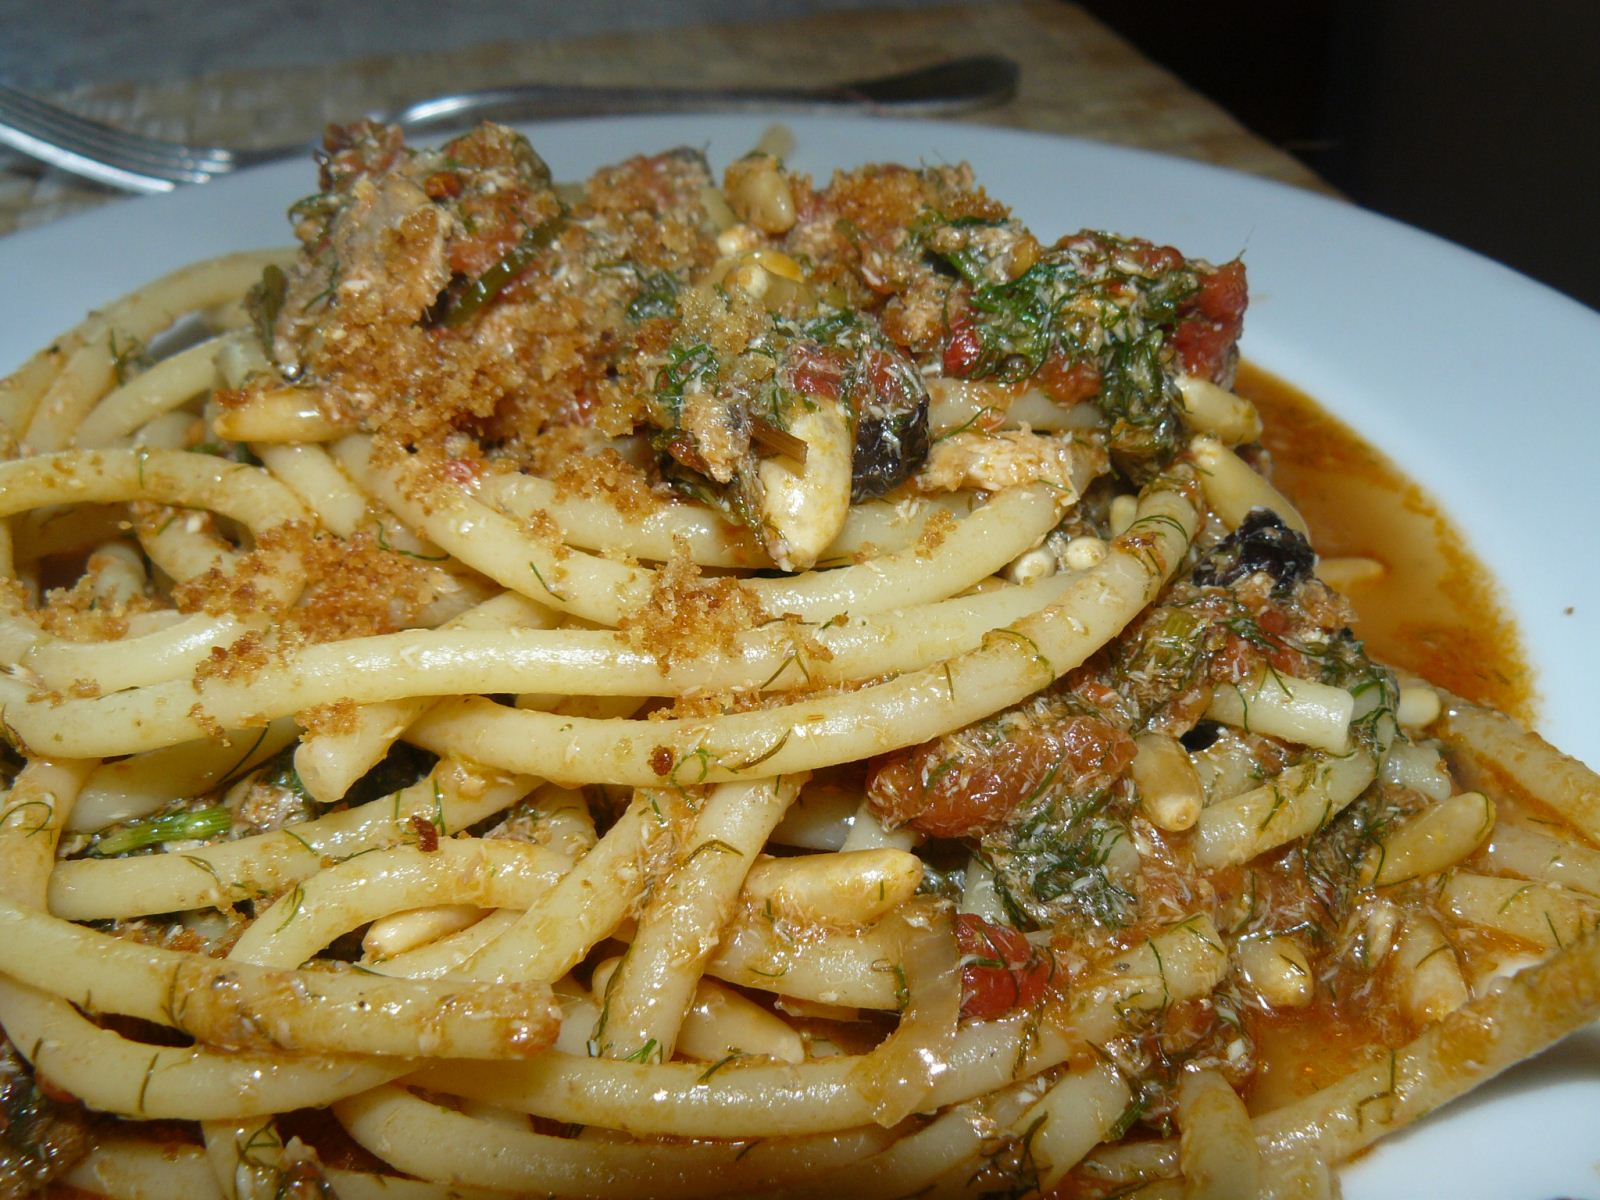 Pasta con le sarde alla milanese (pasta 'a milanisa)